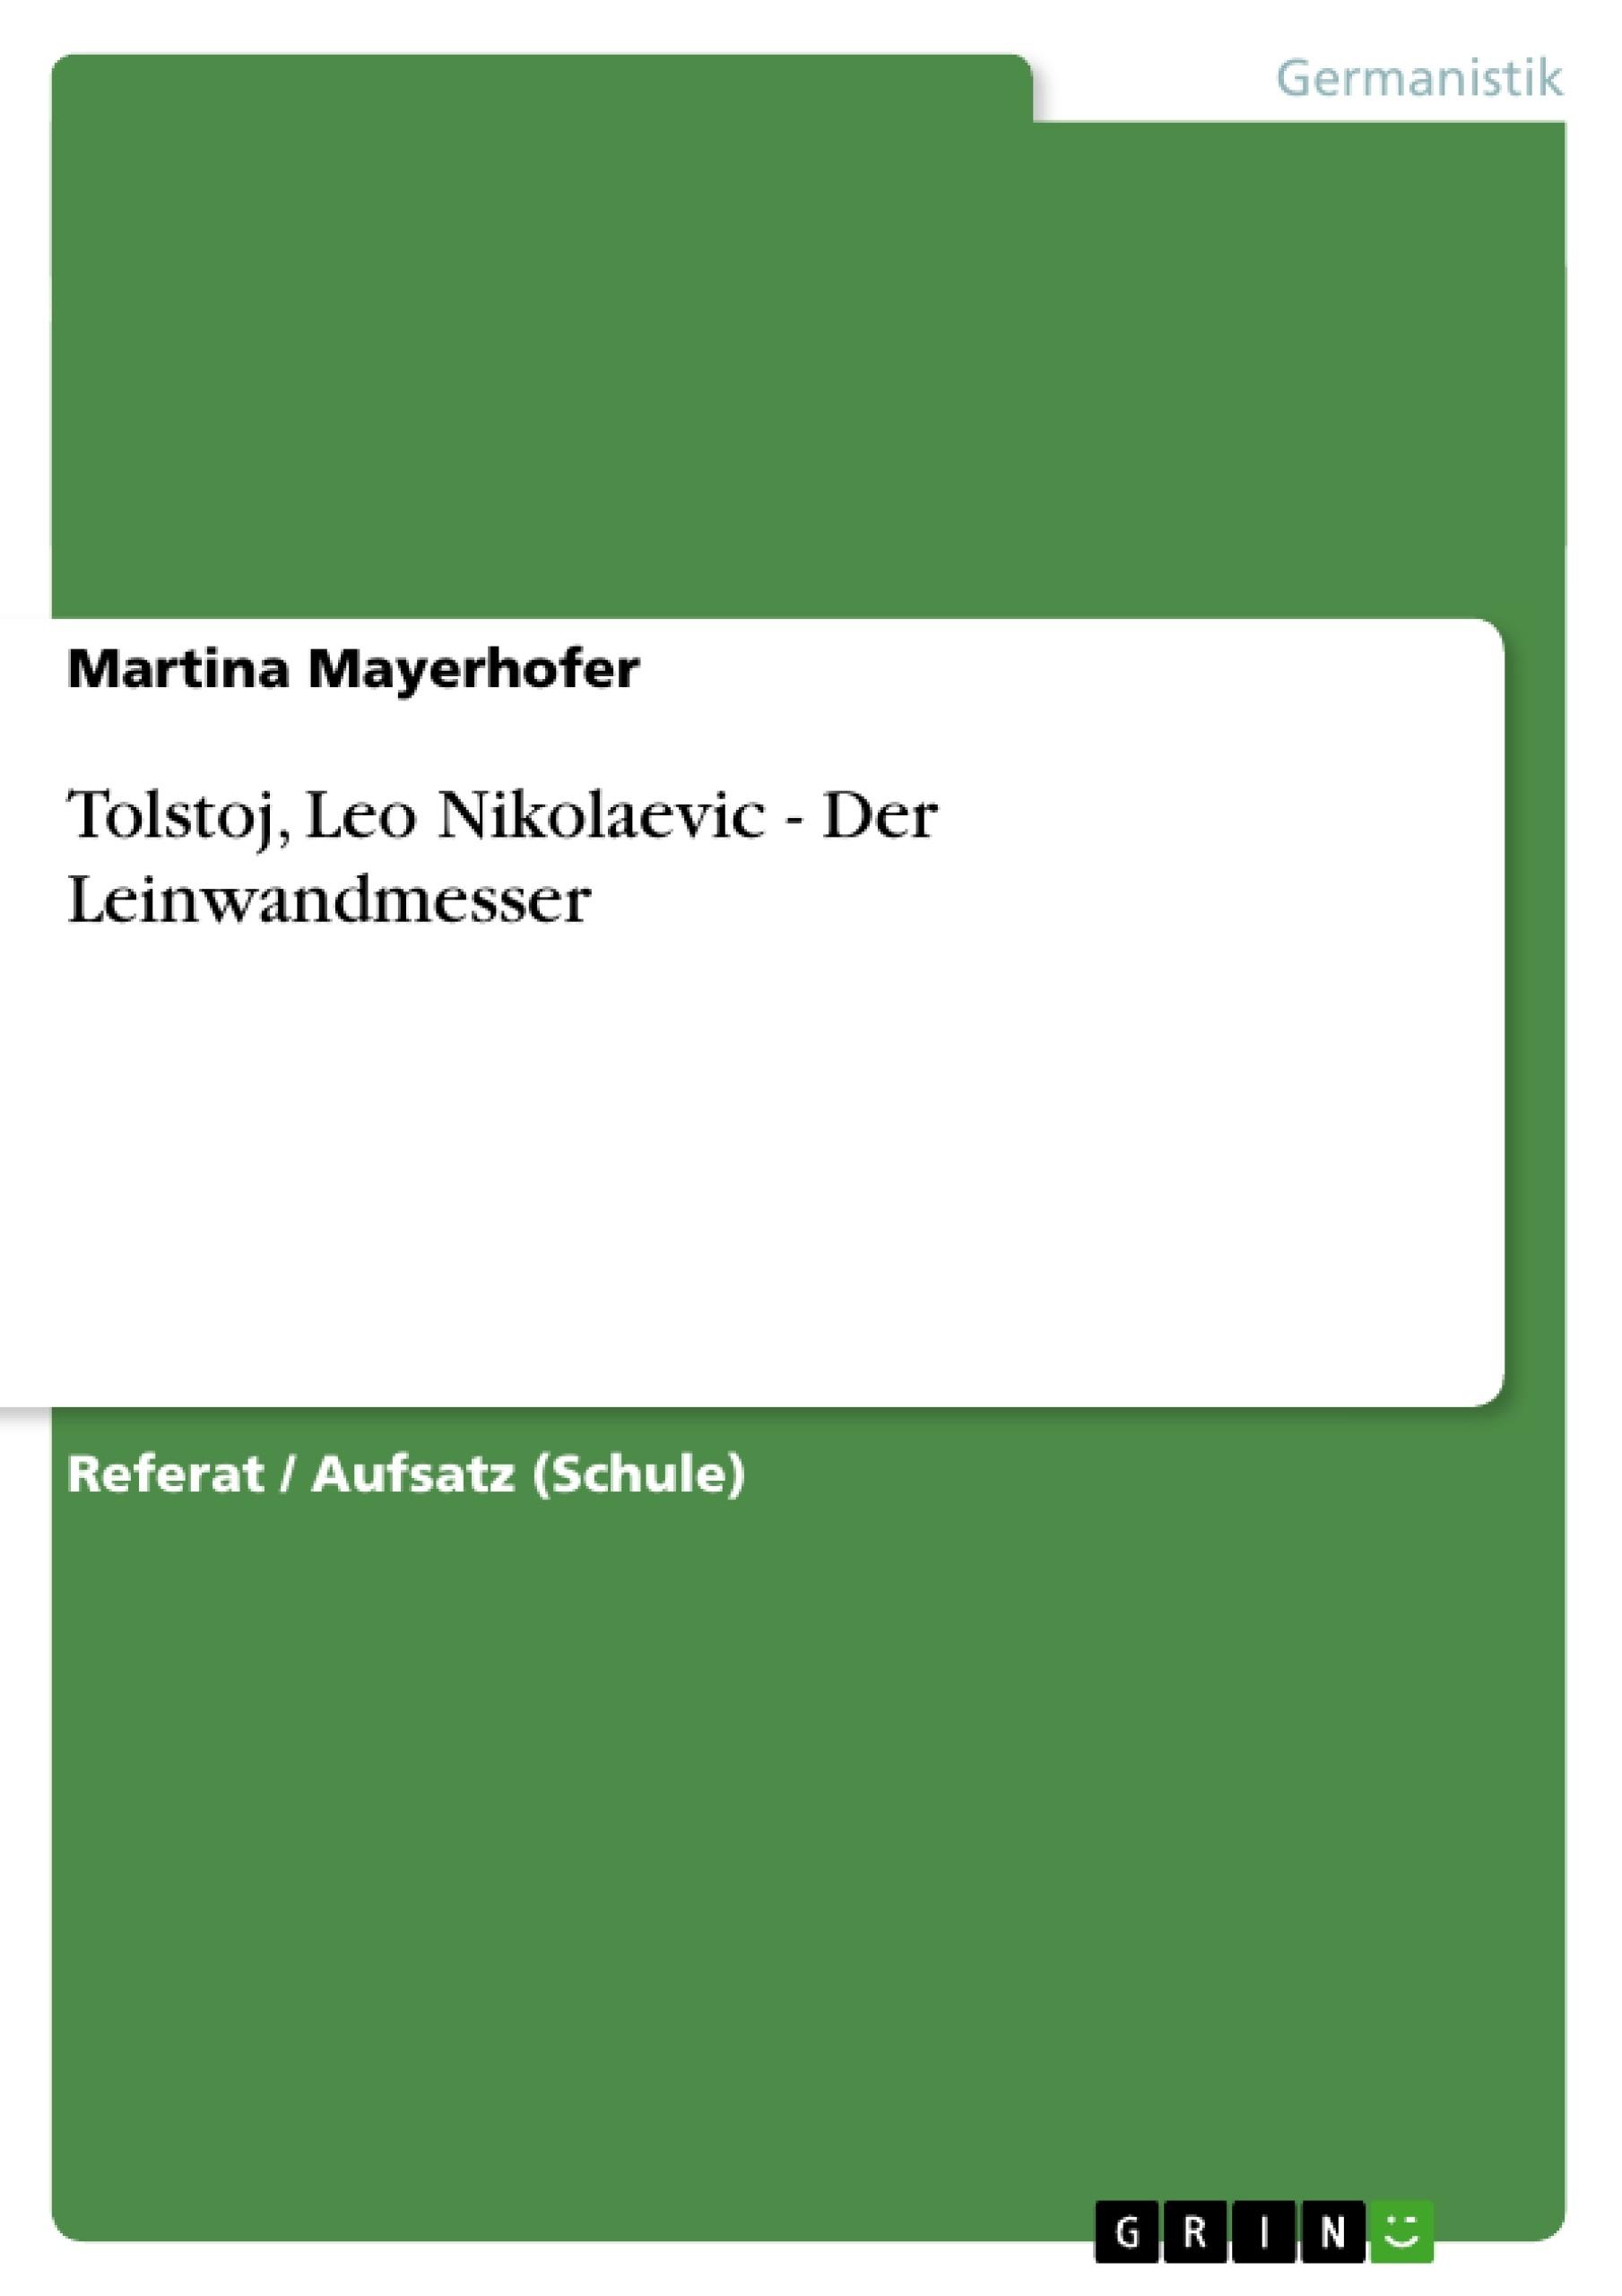 Titel: Tolstoj, Leo Nikolaevic - Der Leinwandmesser